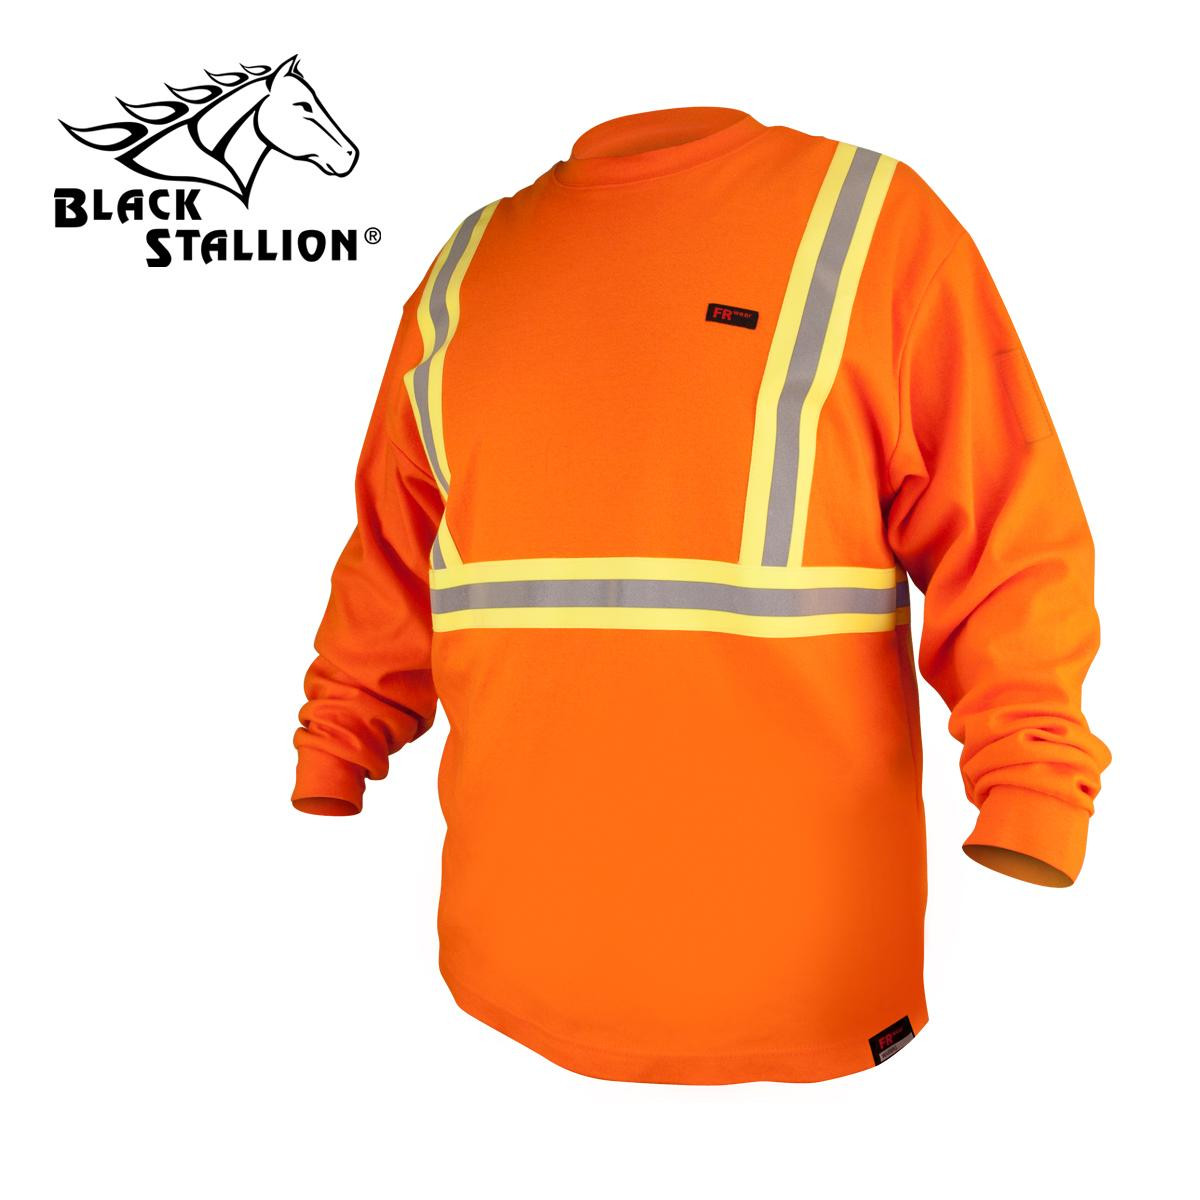 e1d1ab376967 Black Stallion FR Cotton Long Sleeve Shirt